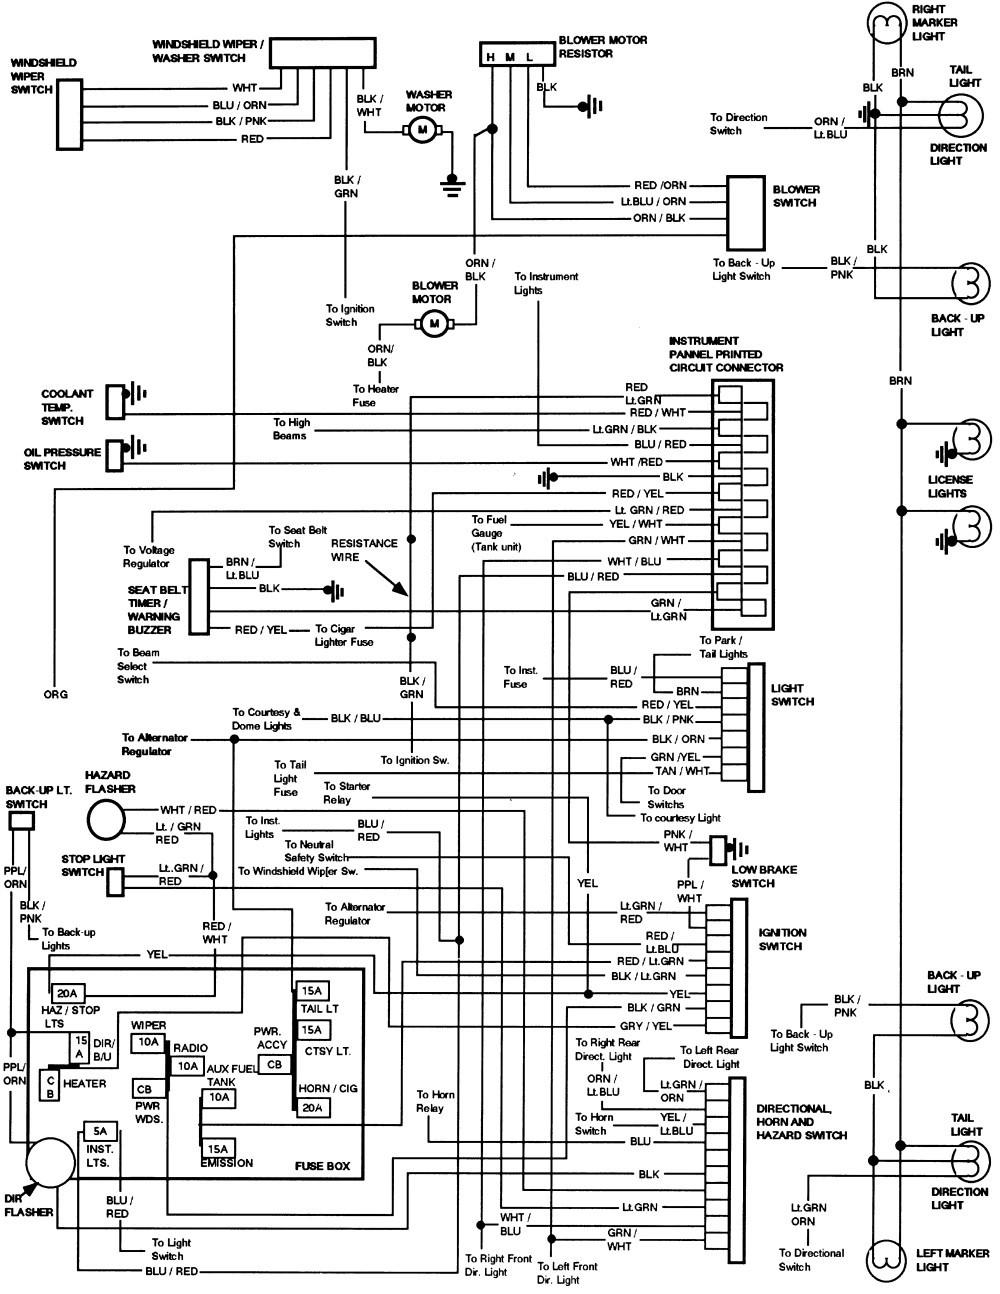 Ford E350 Trailer Wiring Diagram